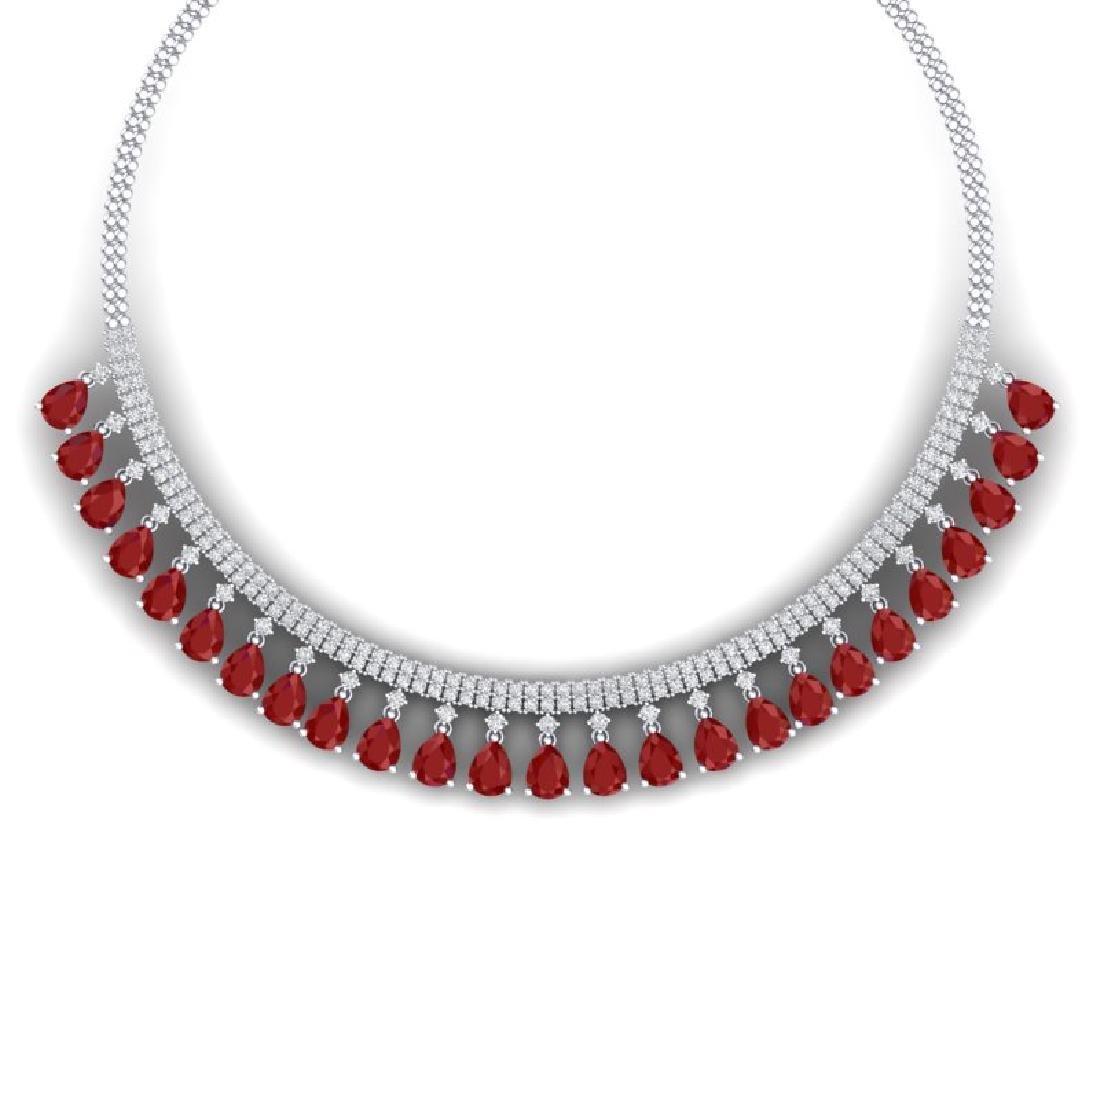 51.75 CTW Royalty Ruby & VS Diamond Necklace 18K White